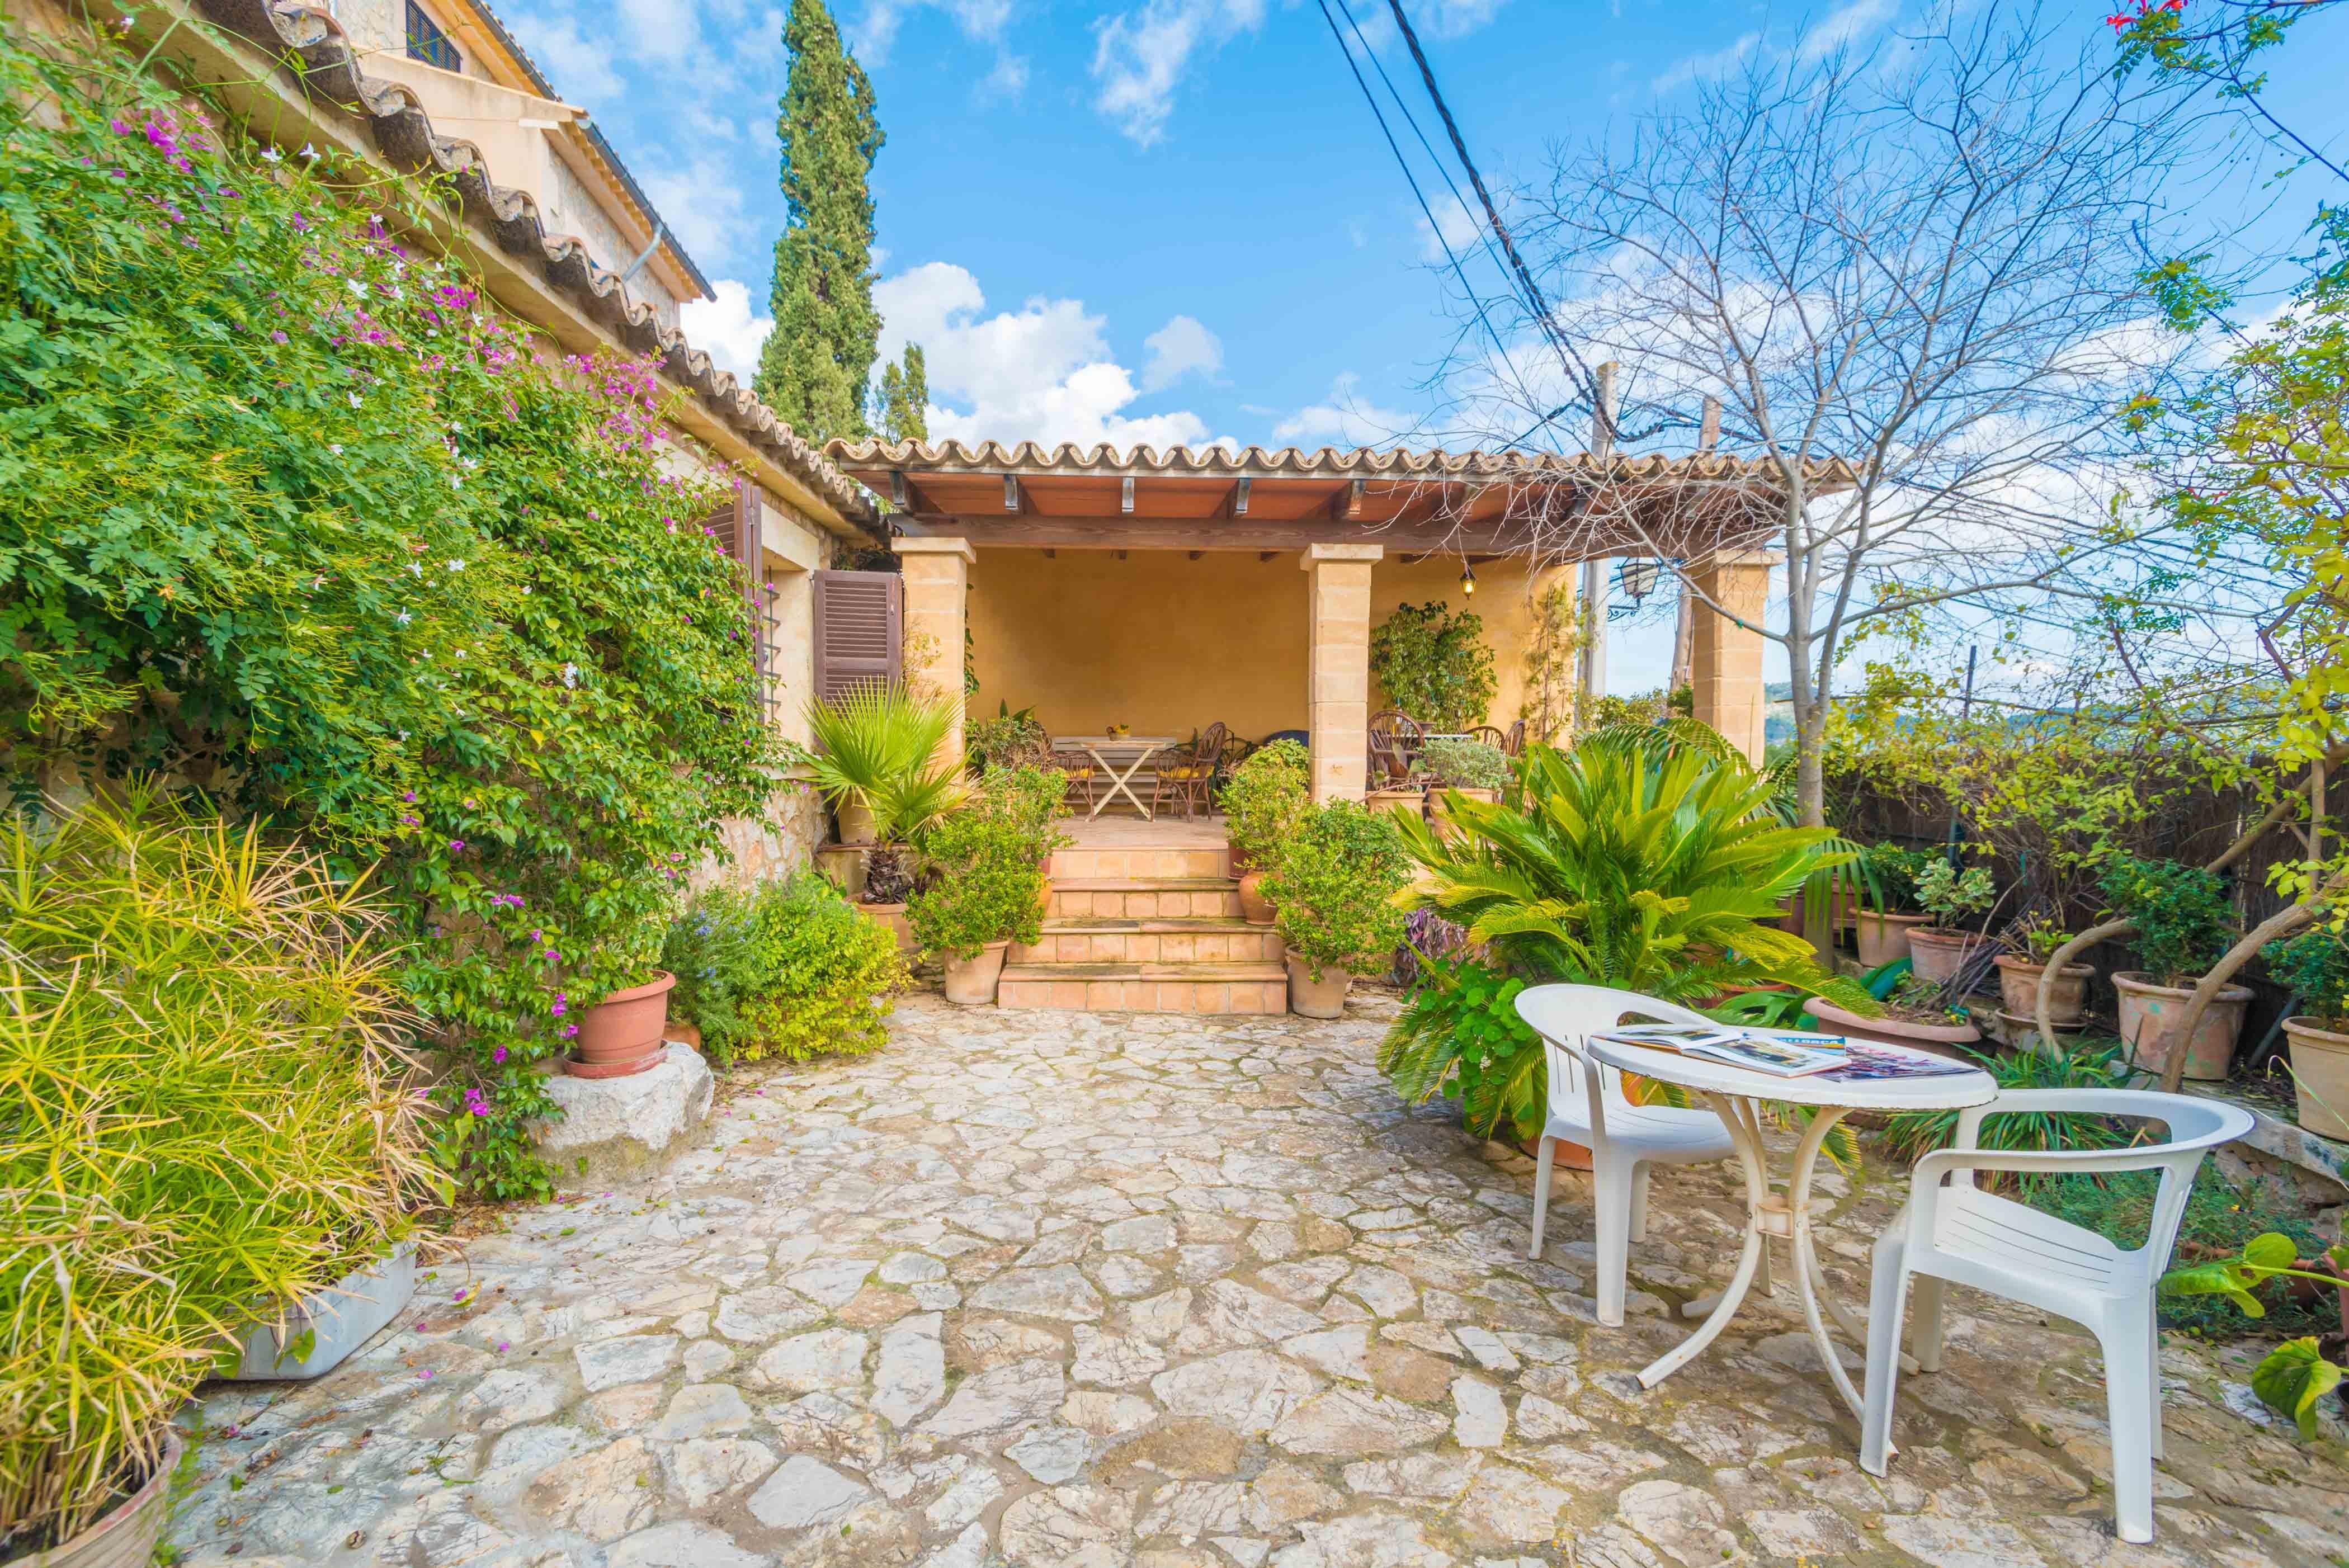 Maison de vacances CA NA CARME (ALARONERA) (2382858), Alaro, Majorque, Iles Baléares, Espagne, image 2